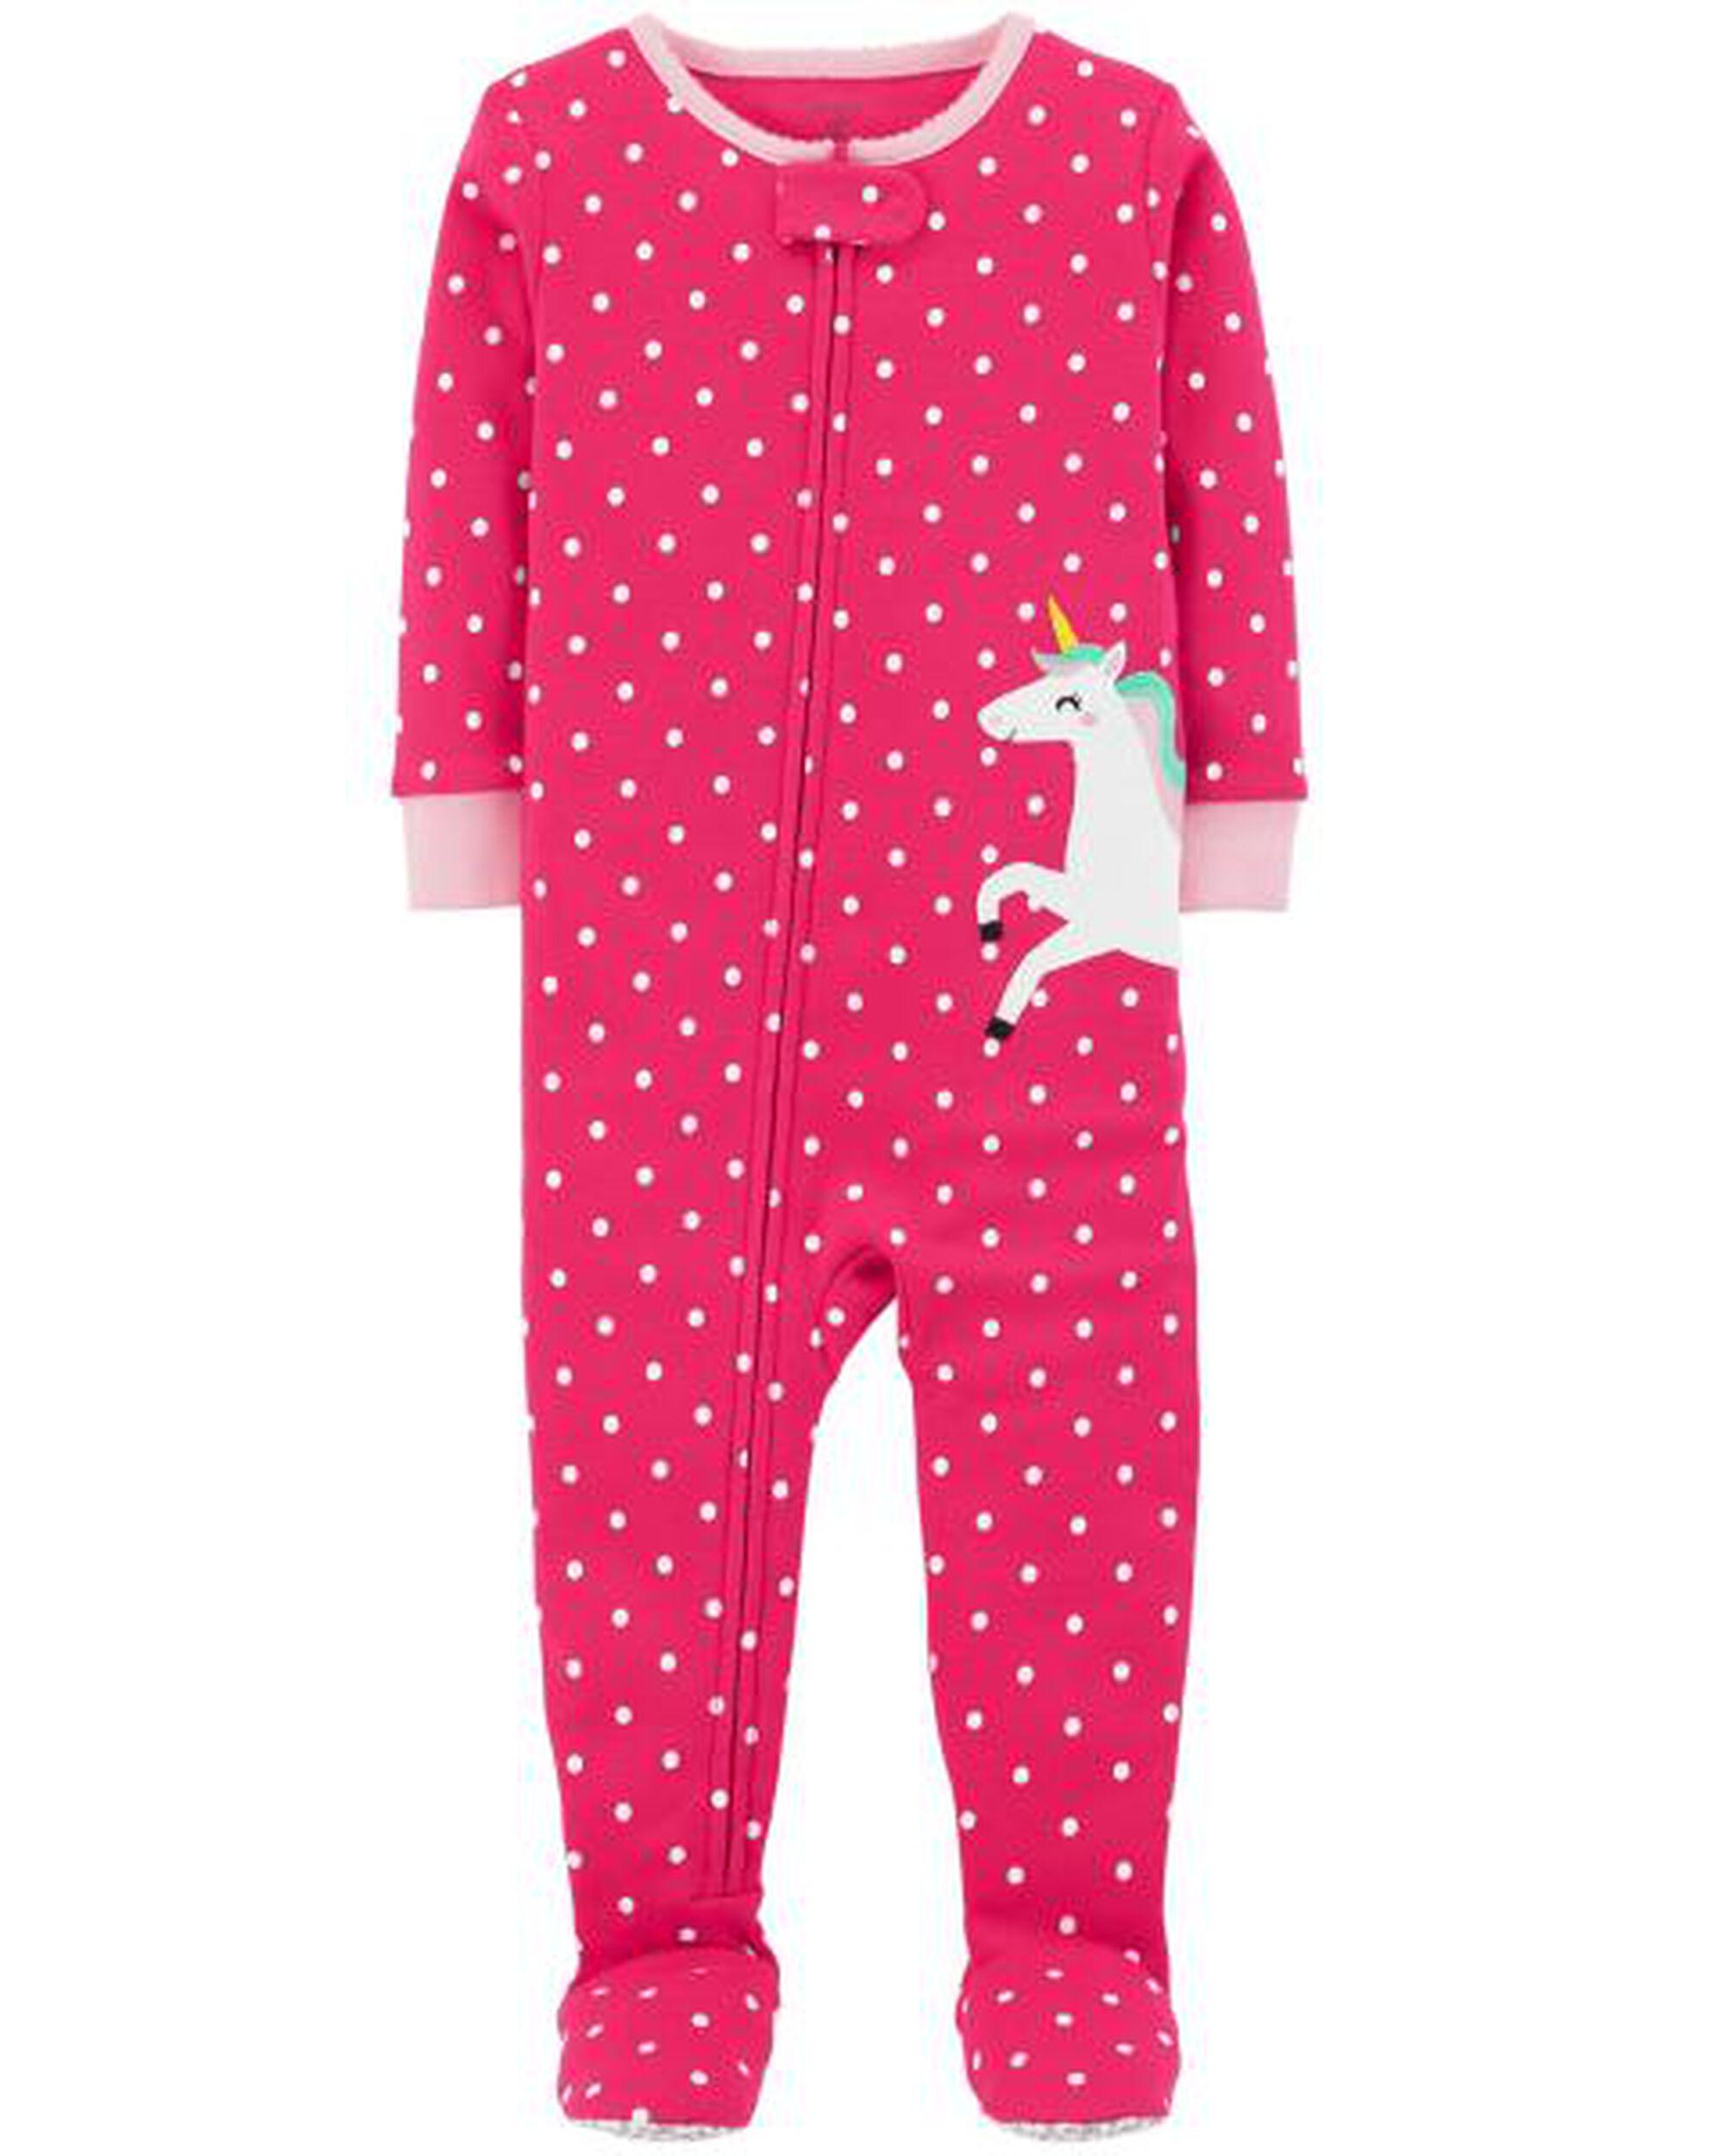 5c4f2dd88 1-Piece Unicorn Snug Fit Cotton PJs